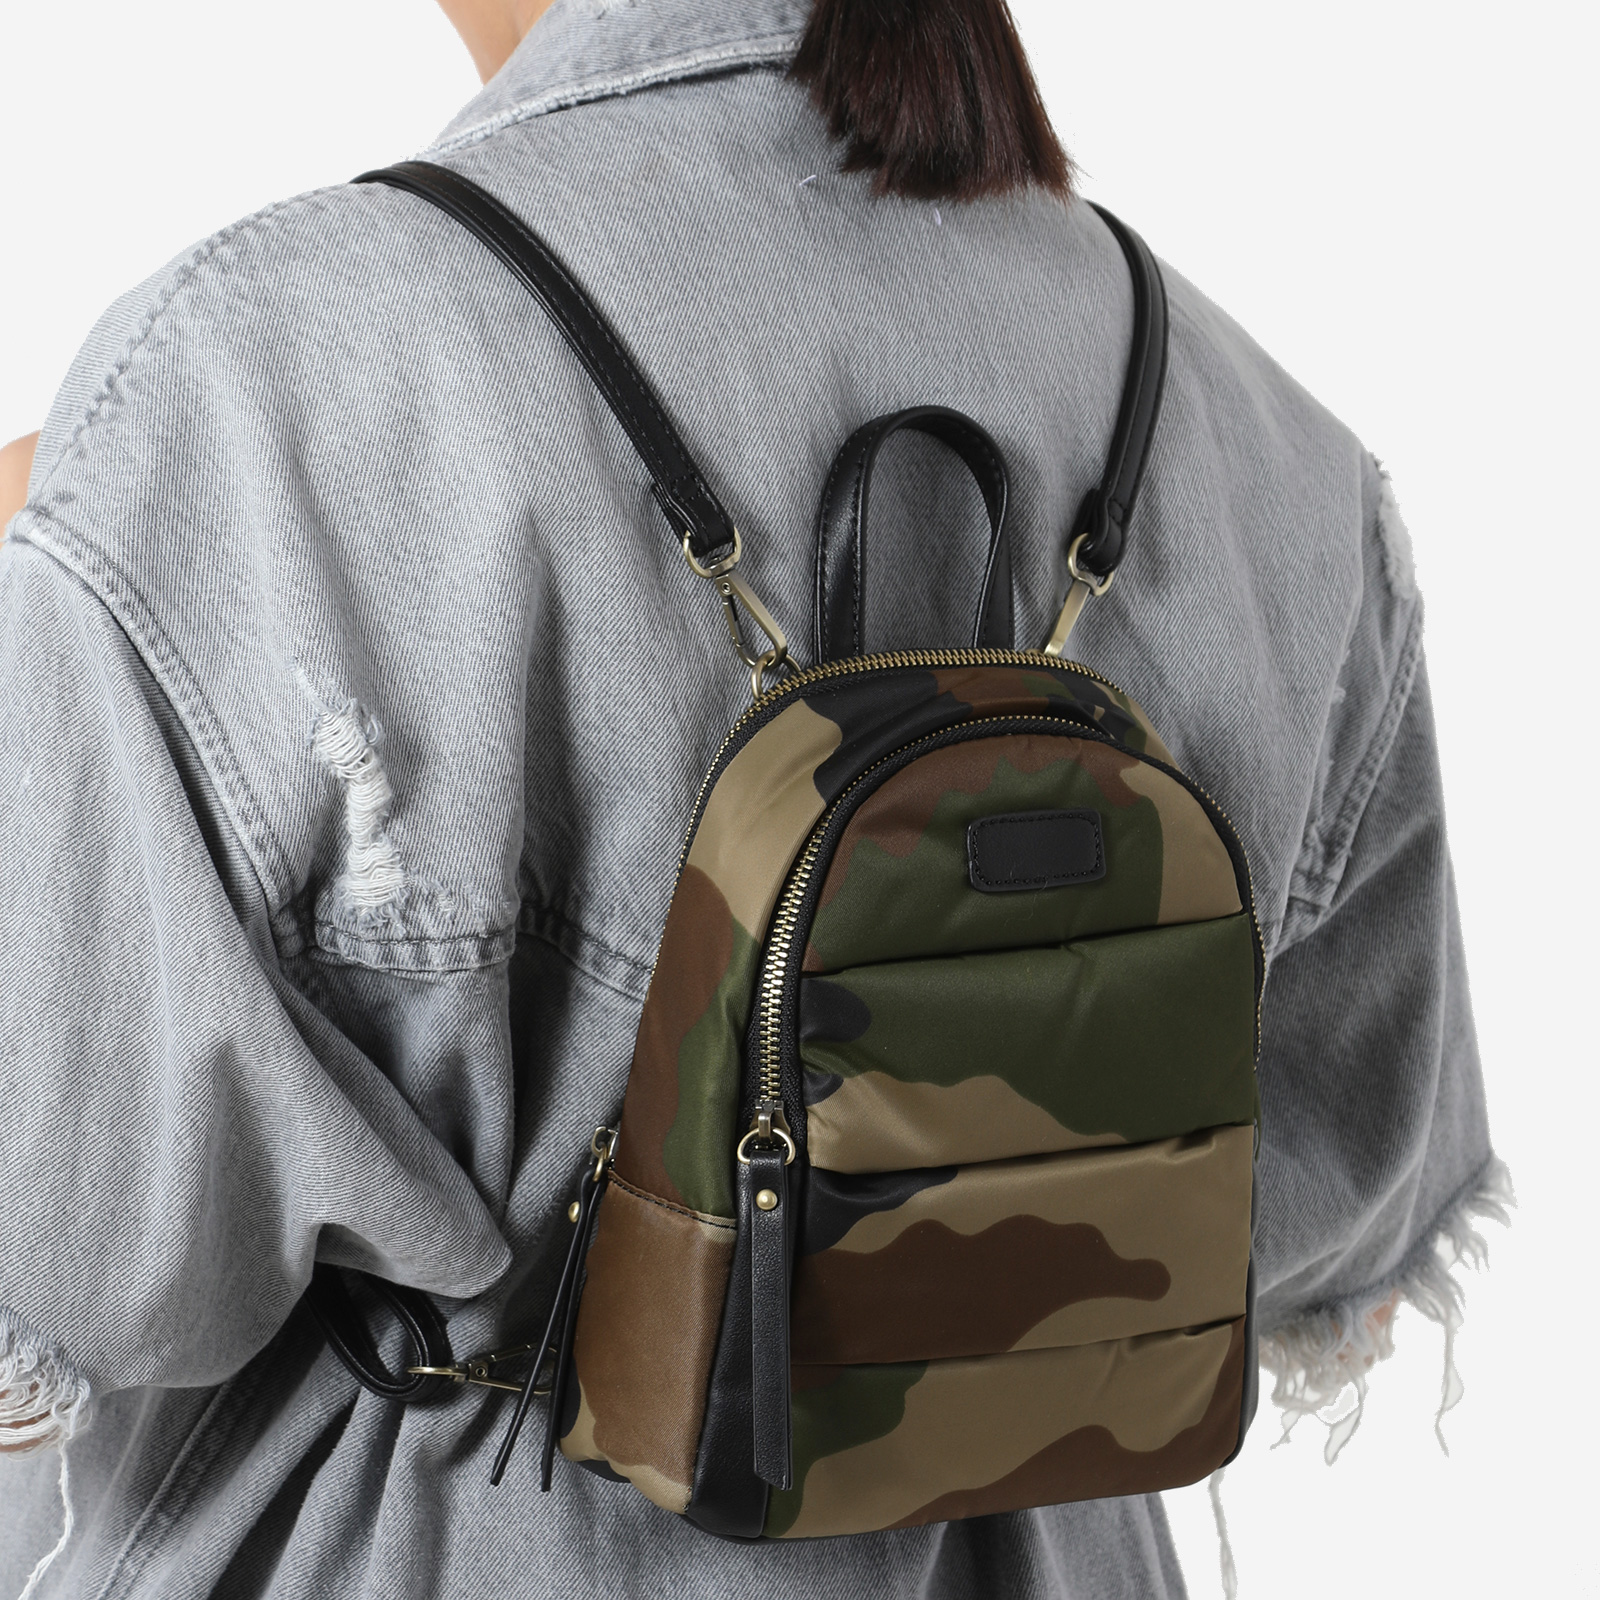 Mini Back Pack In Green Camo Print Nylon